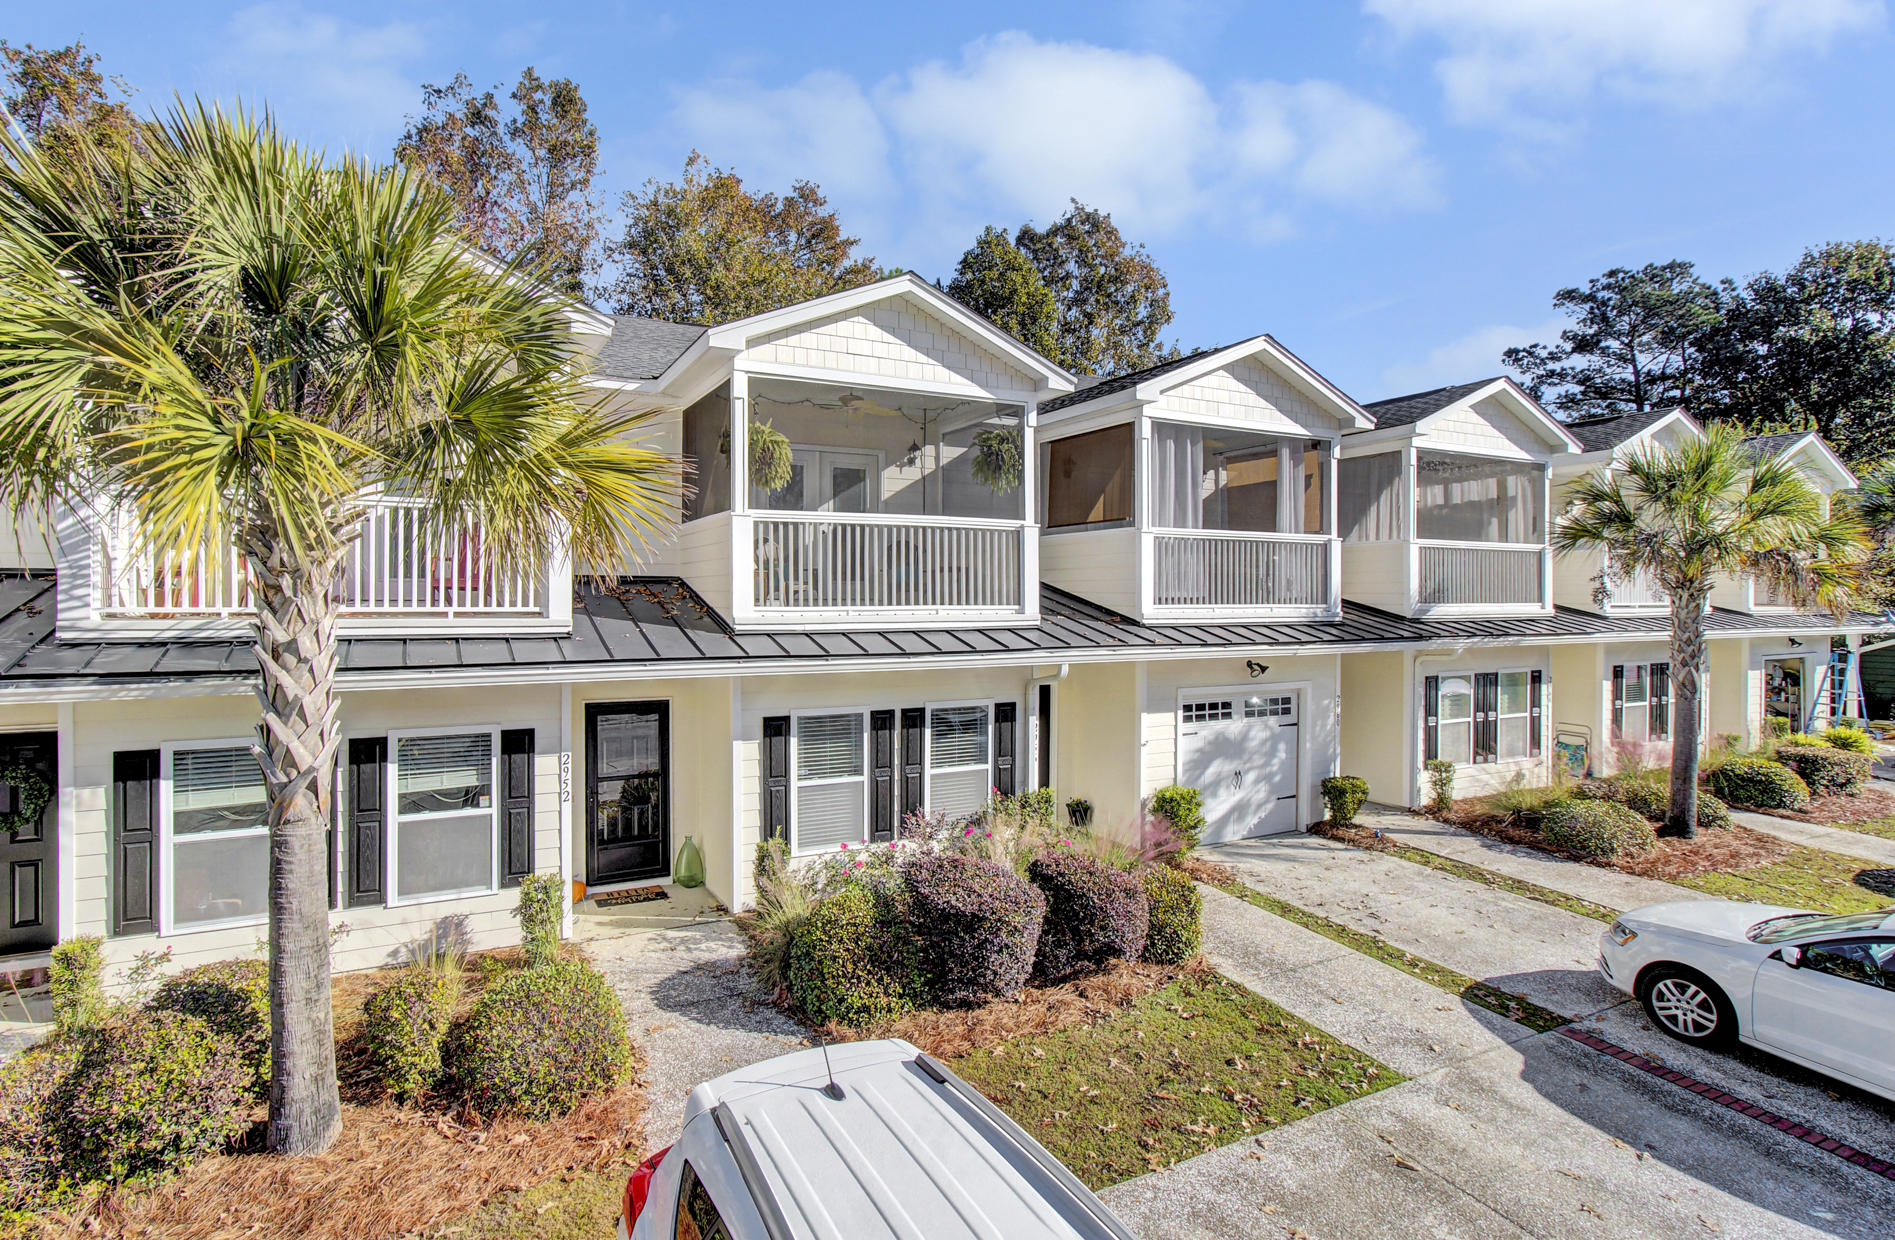 Carol Oaks Town Homes Homes For Sale - 2956 Emma, Mount Pleasant, SC - 12